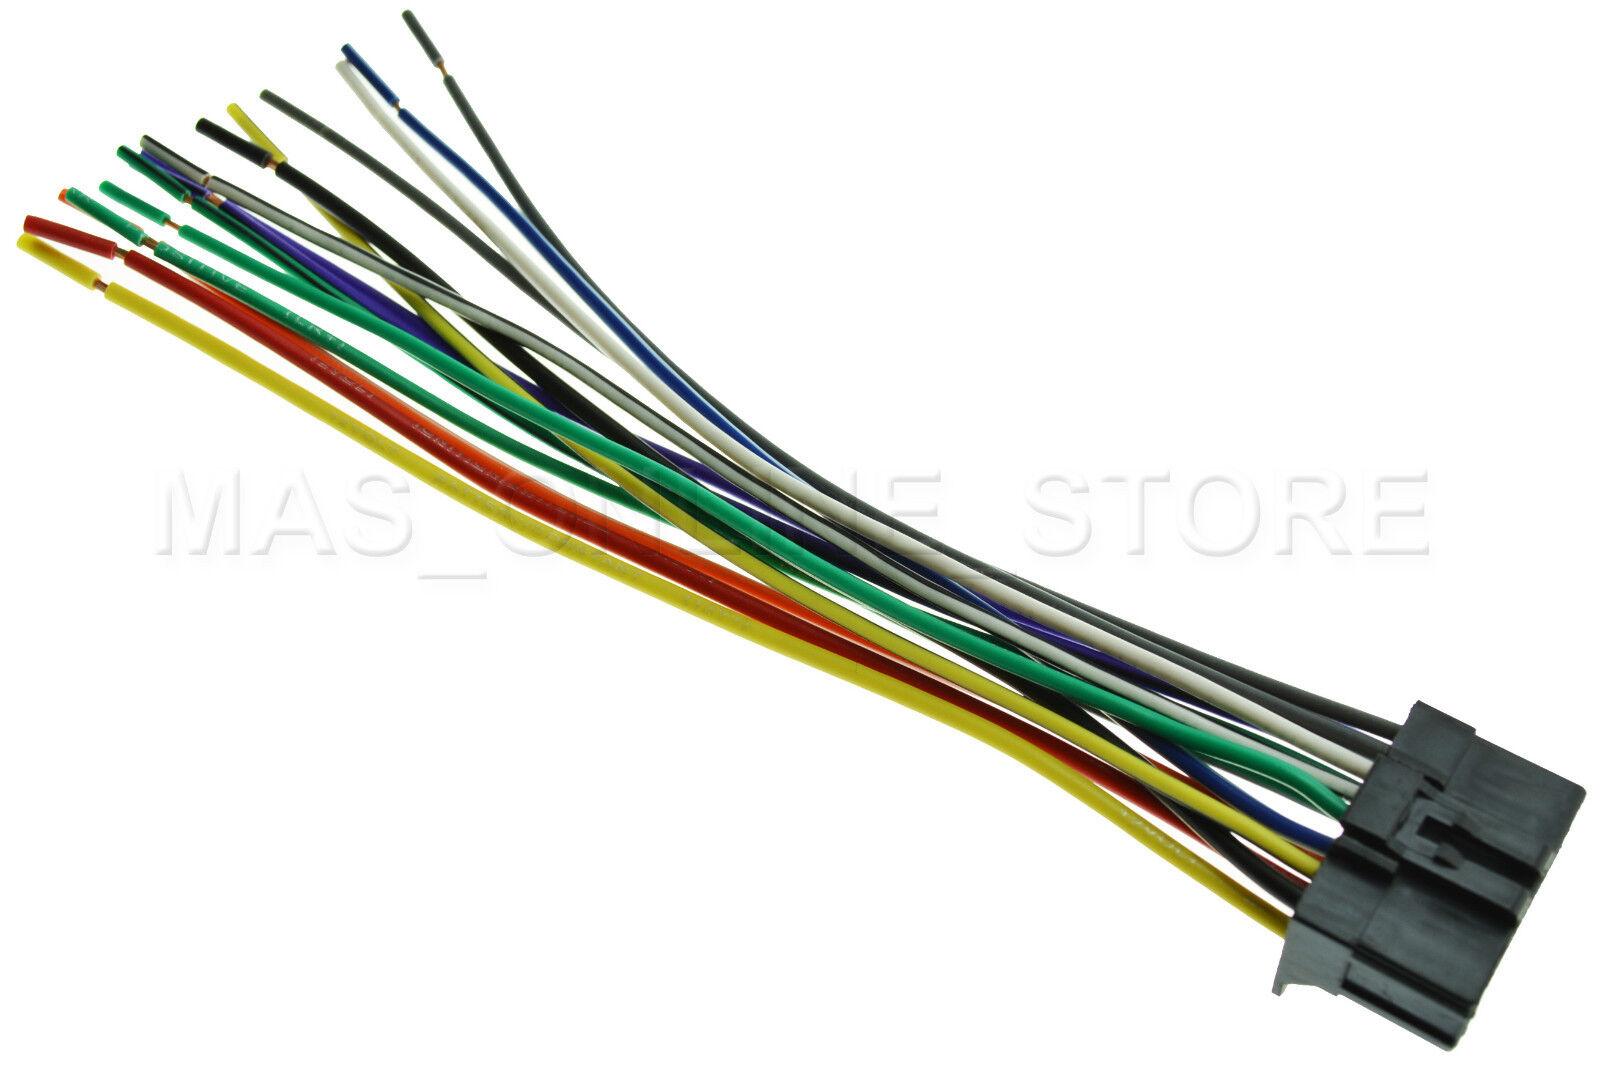 wire harness for pioneer avh p3200dvd avhp3200dvd pay today ships rh ebay com GM Wiring Harness Connectors Trailer Wiring Harness Connectors